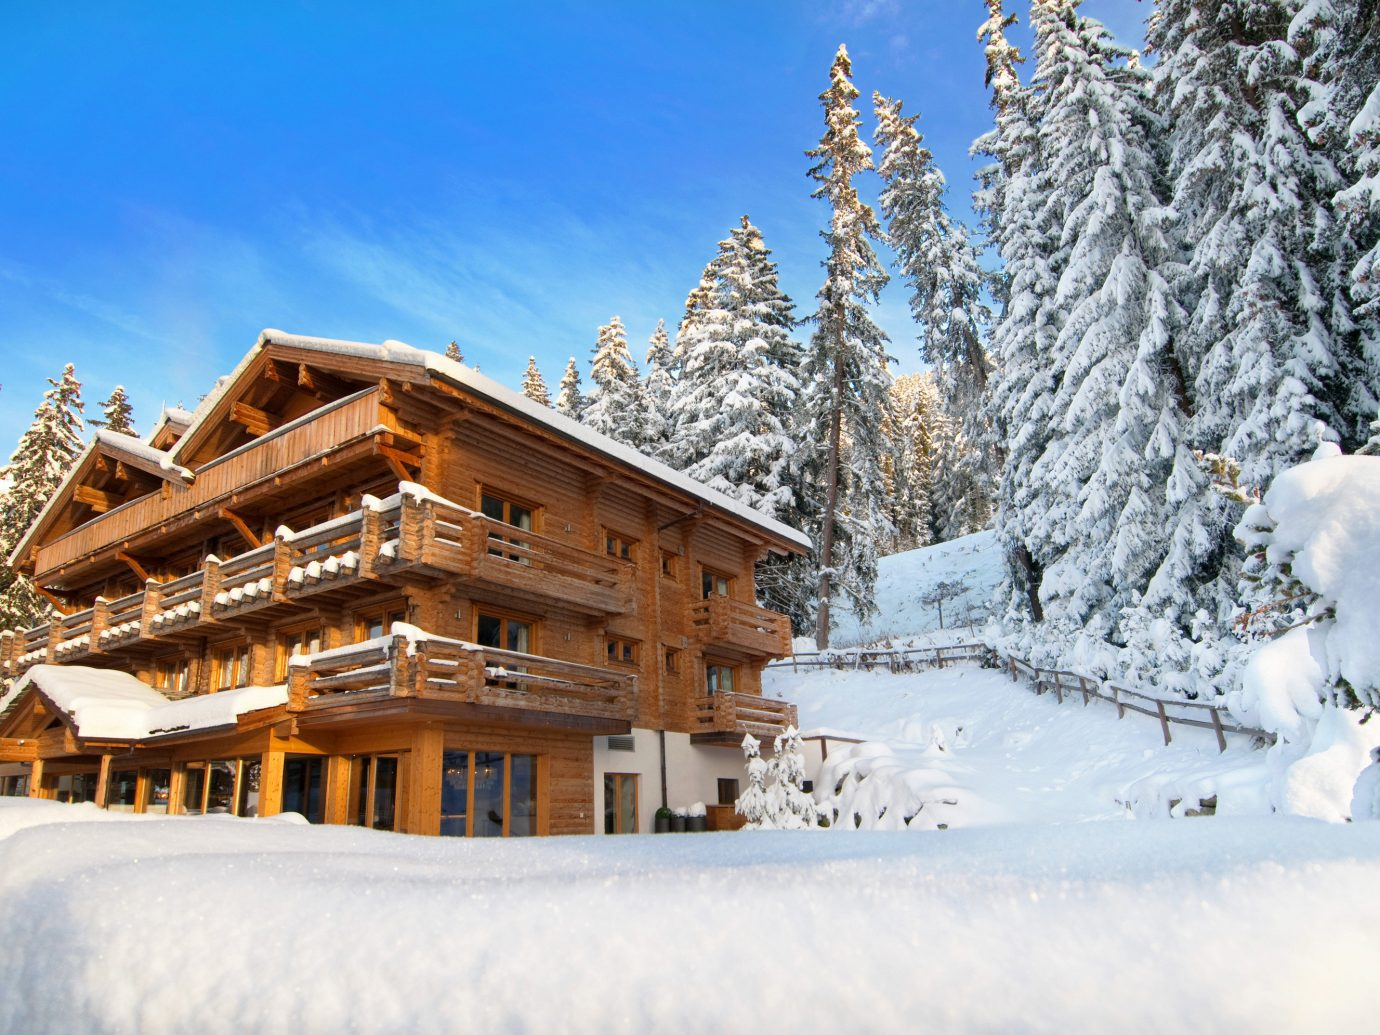 Hotels Luxury Travel Mountains + Skiing outdoor snow tree sky Winter weather season geological phenomenon Resort Nature mountain mountain range